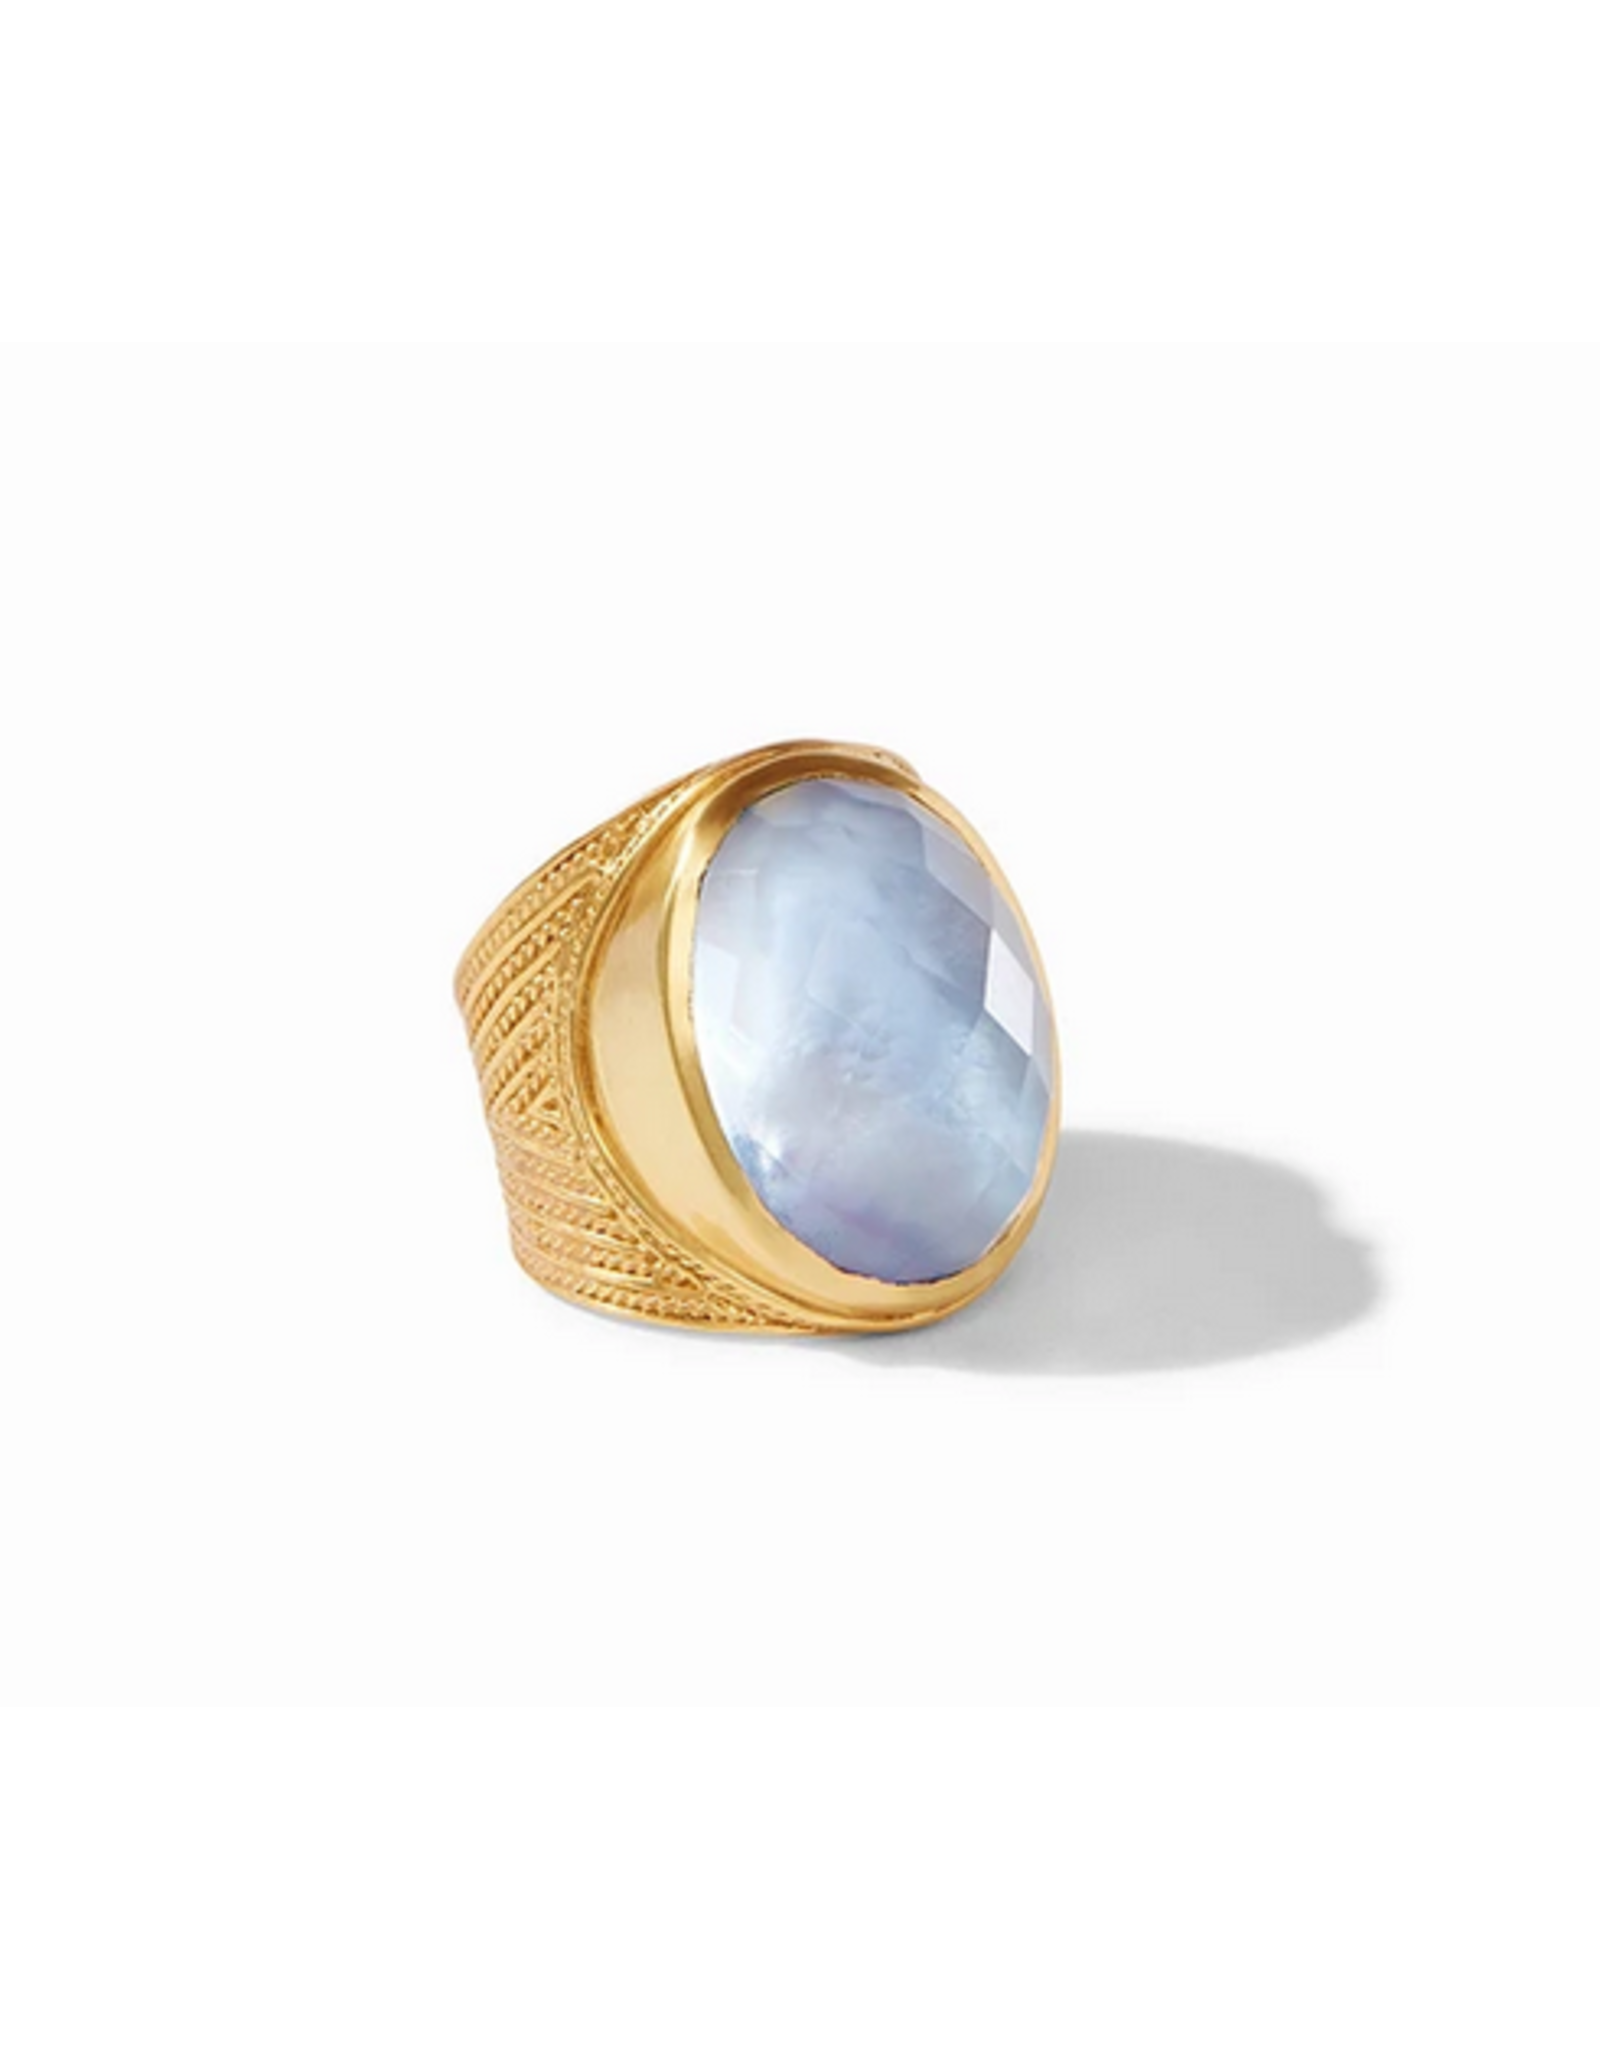 Julie Vos Verona Statement Ring in Iridescent Ice Blue by Julie Vos Size 7 Adjustable